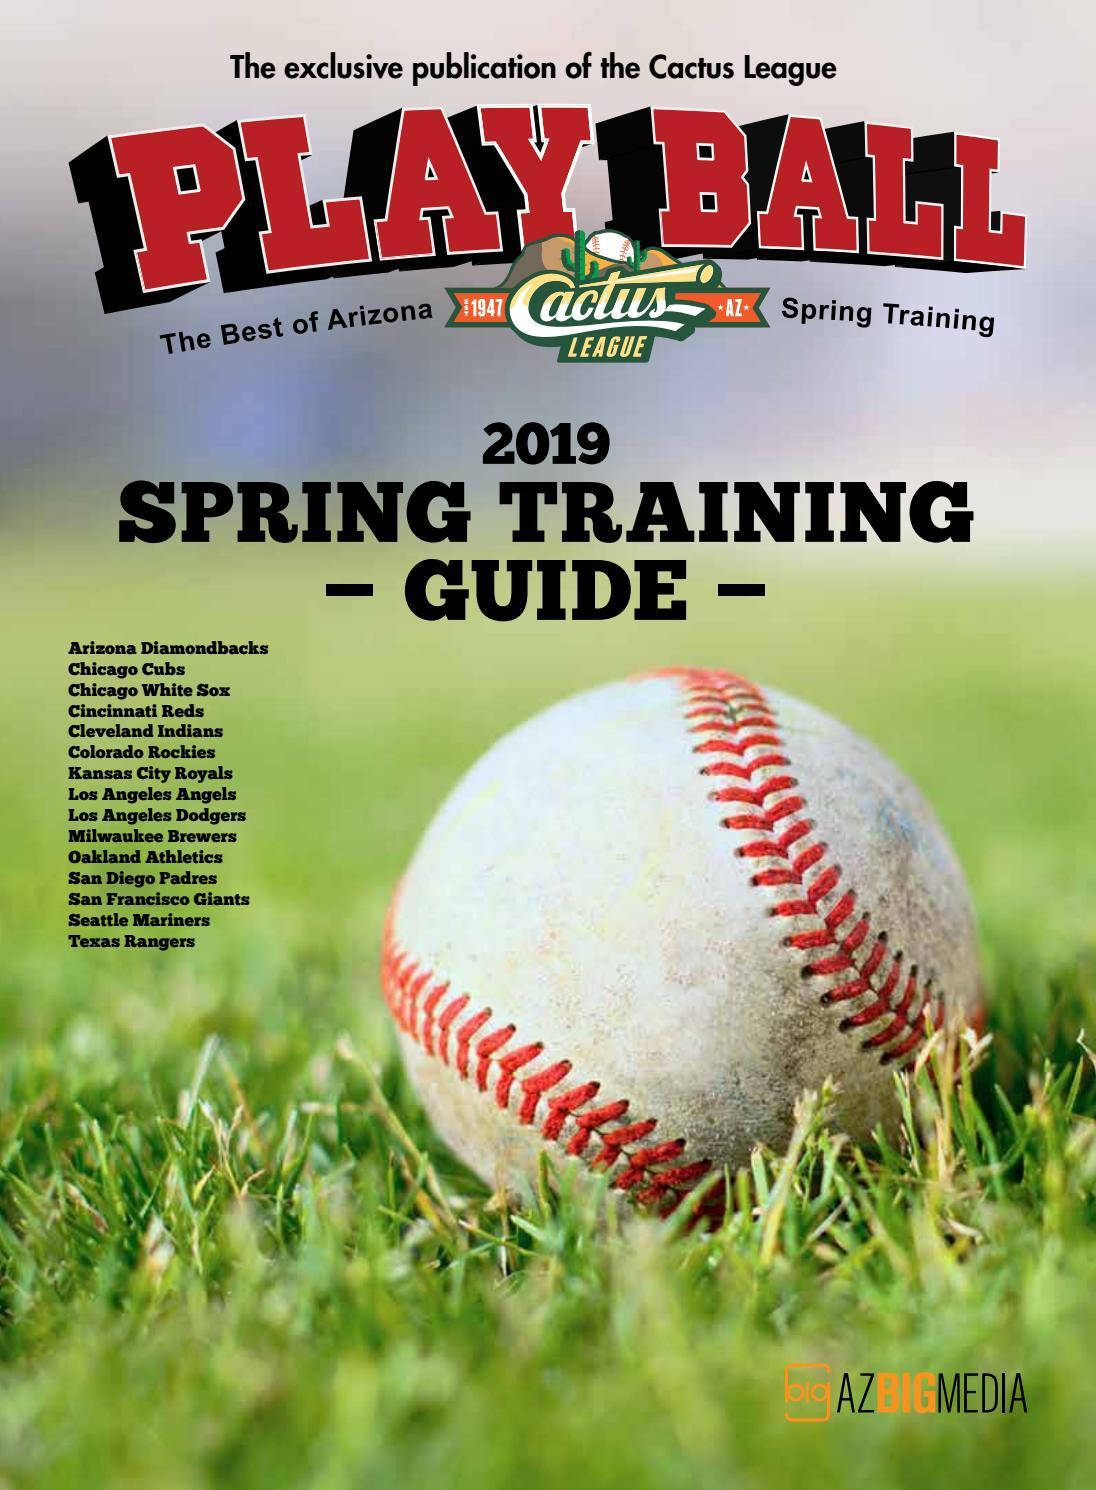 12bc796b4c1 Playball 2019 - The Best of Arizona Spring Training by AZ Big Media ...